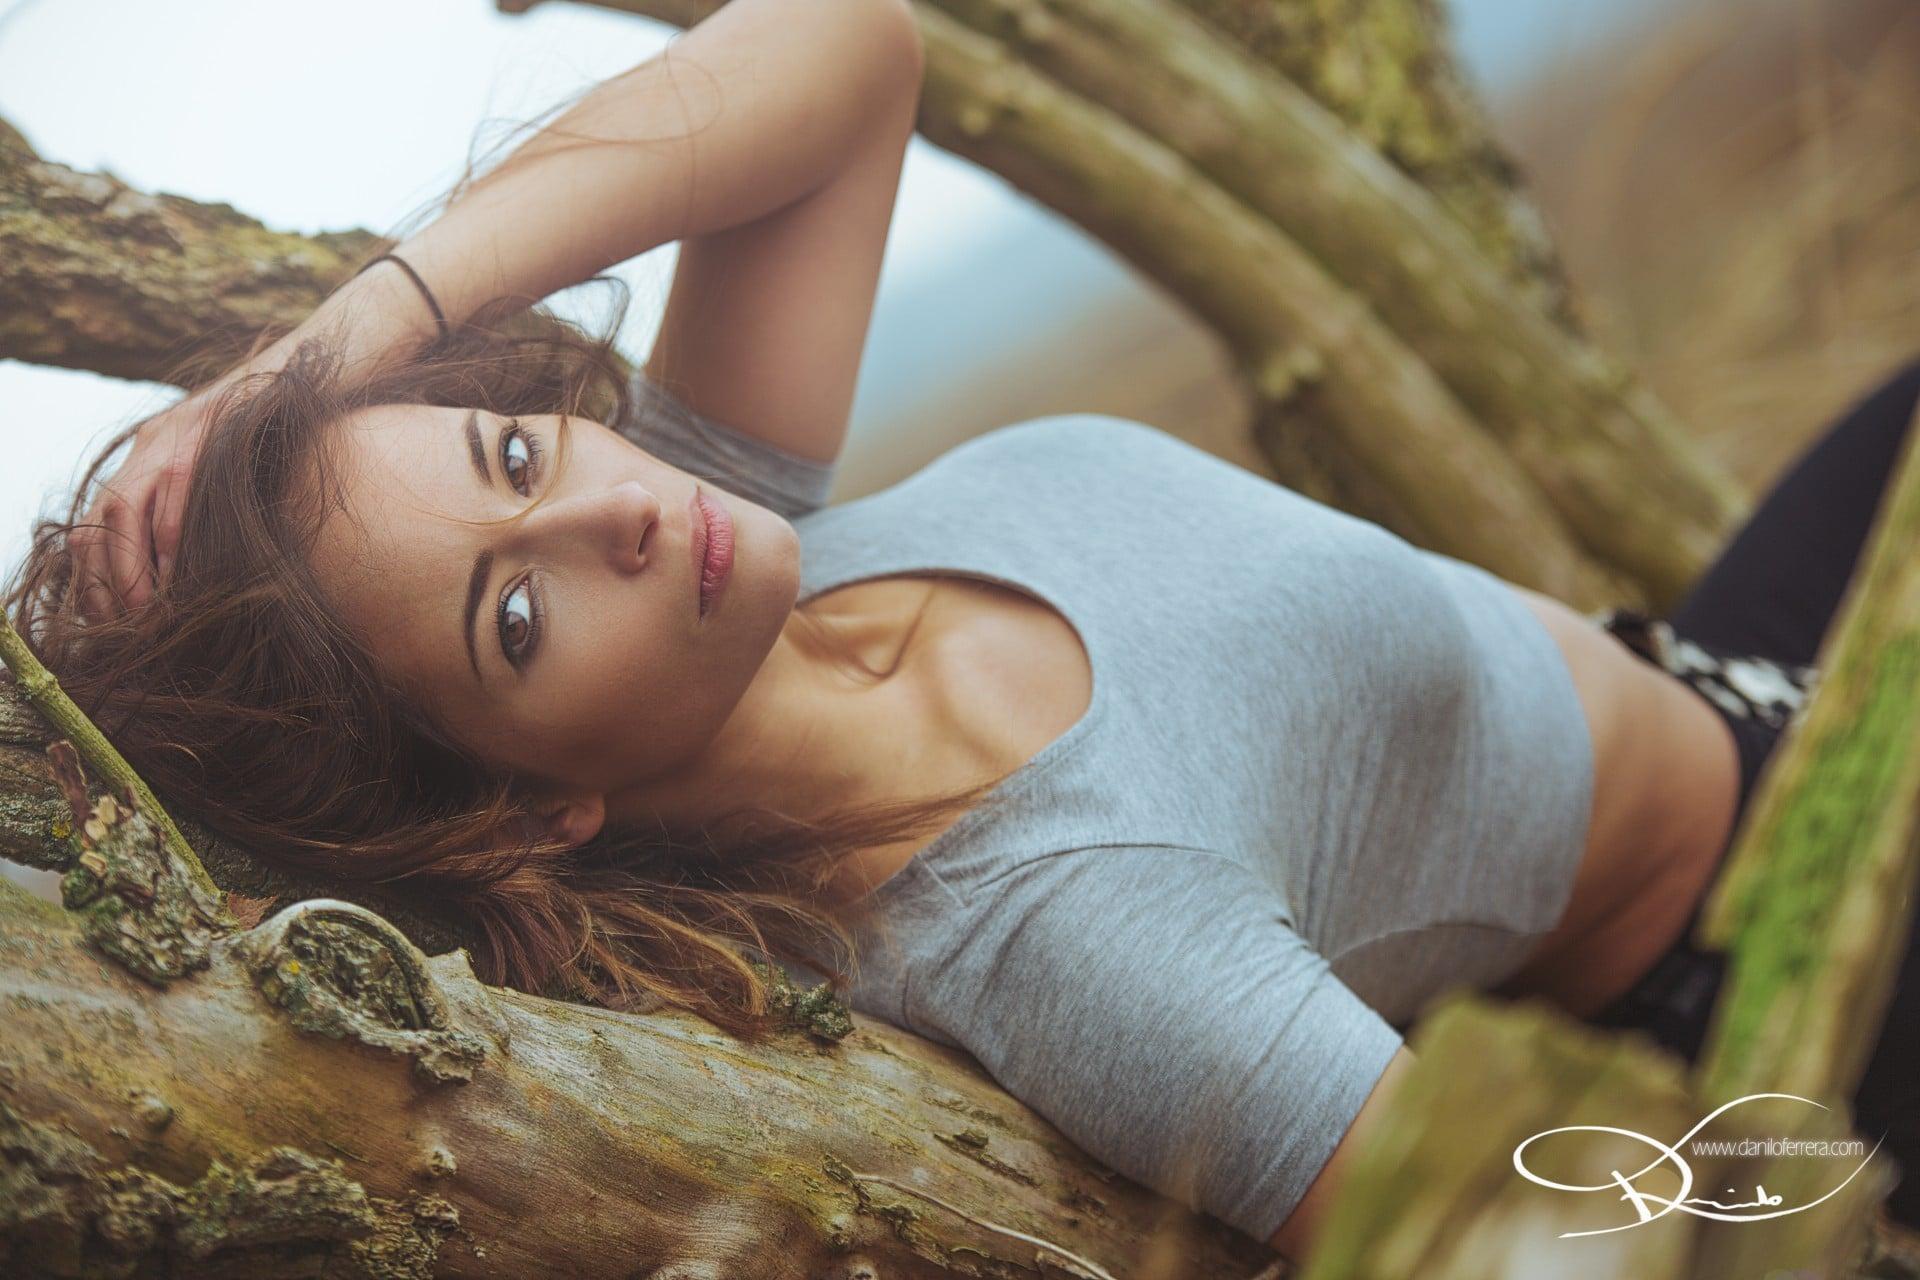 262-Danilo-Ferrera-Fotoshooting-RXlk5UaK